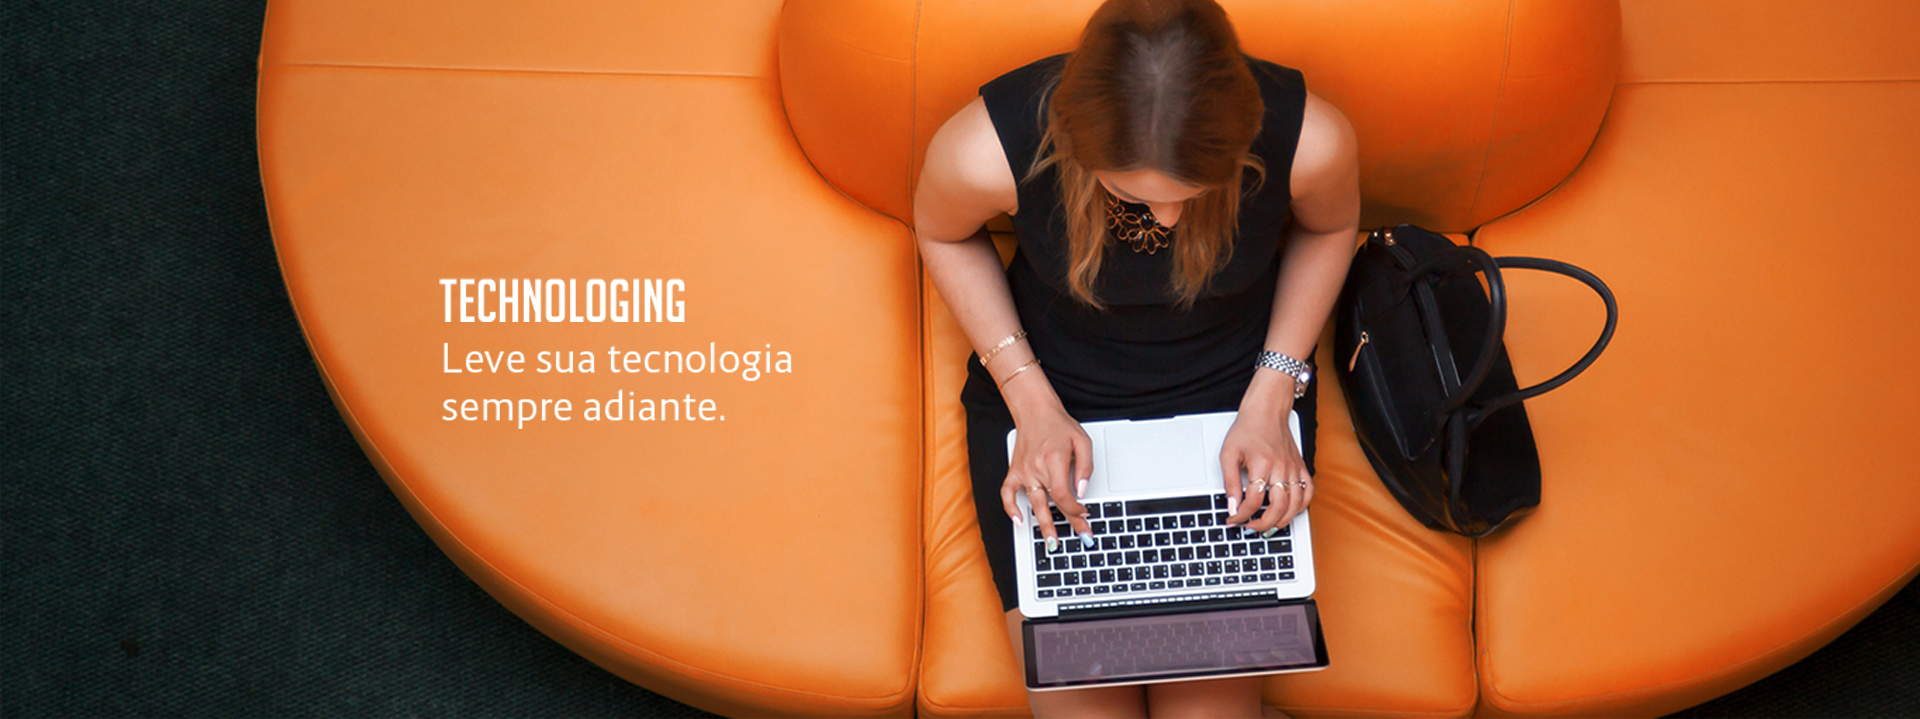 Tecnologing